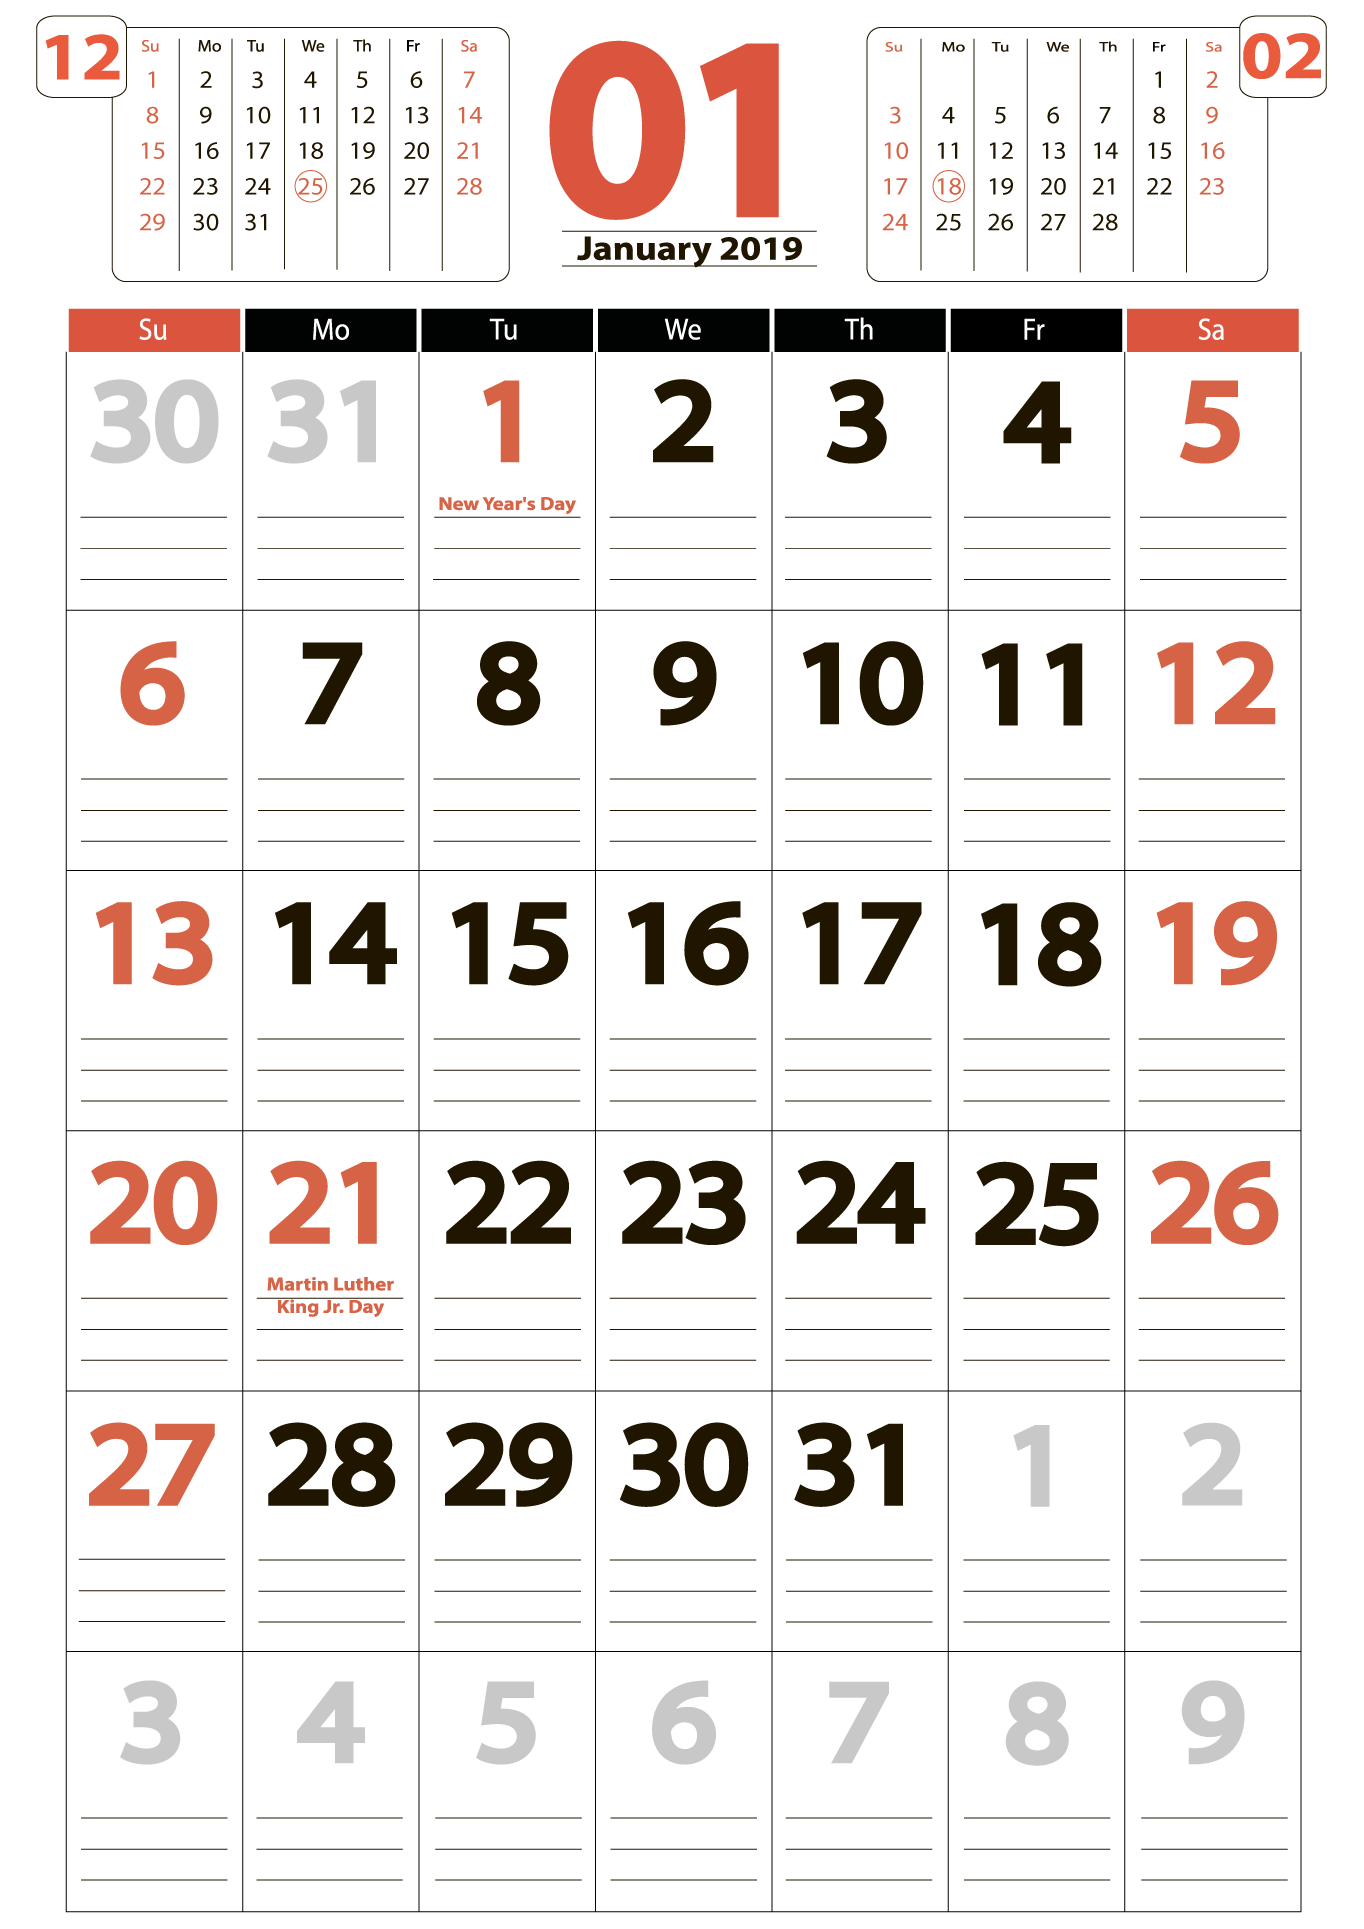 Download calendar 01 2019